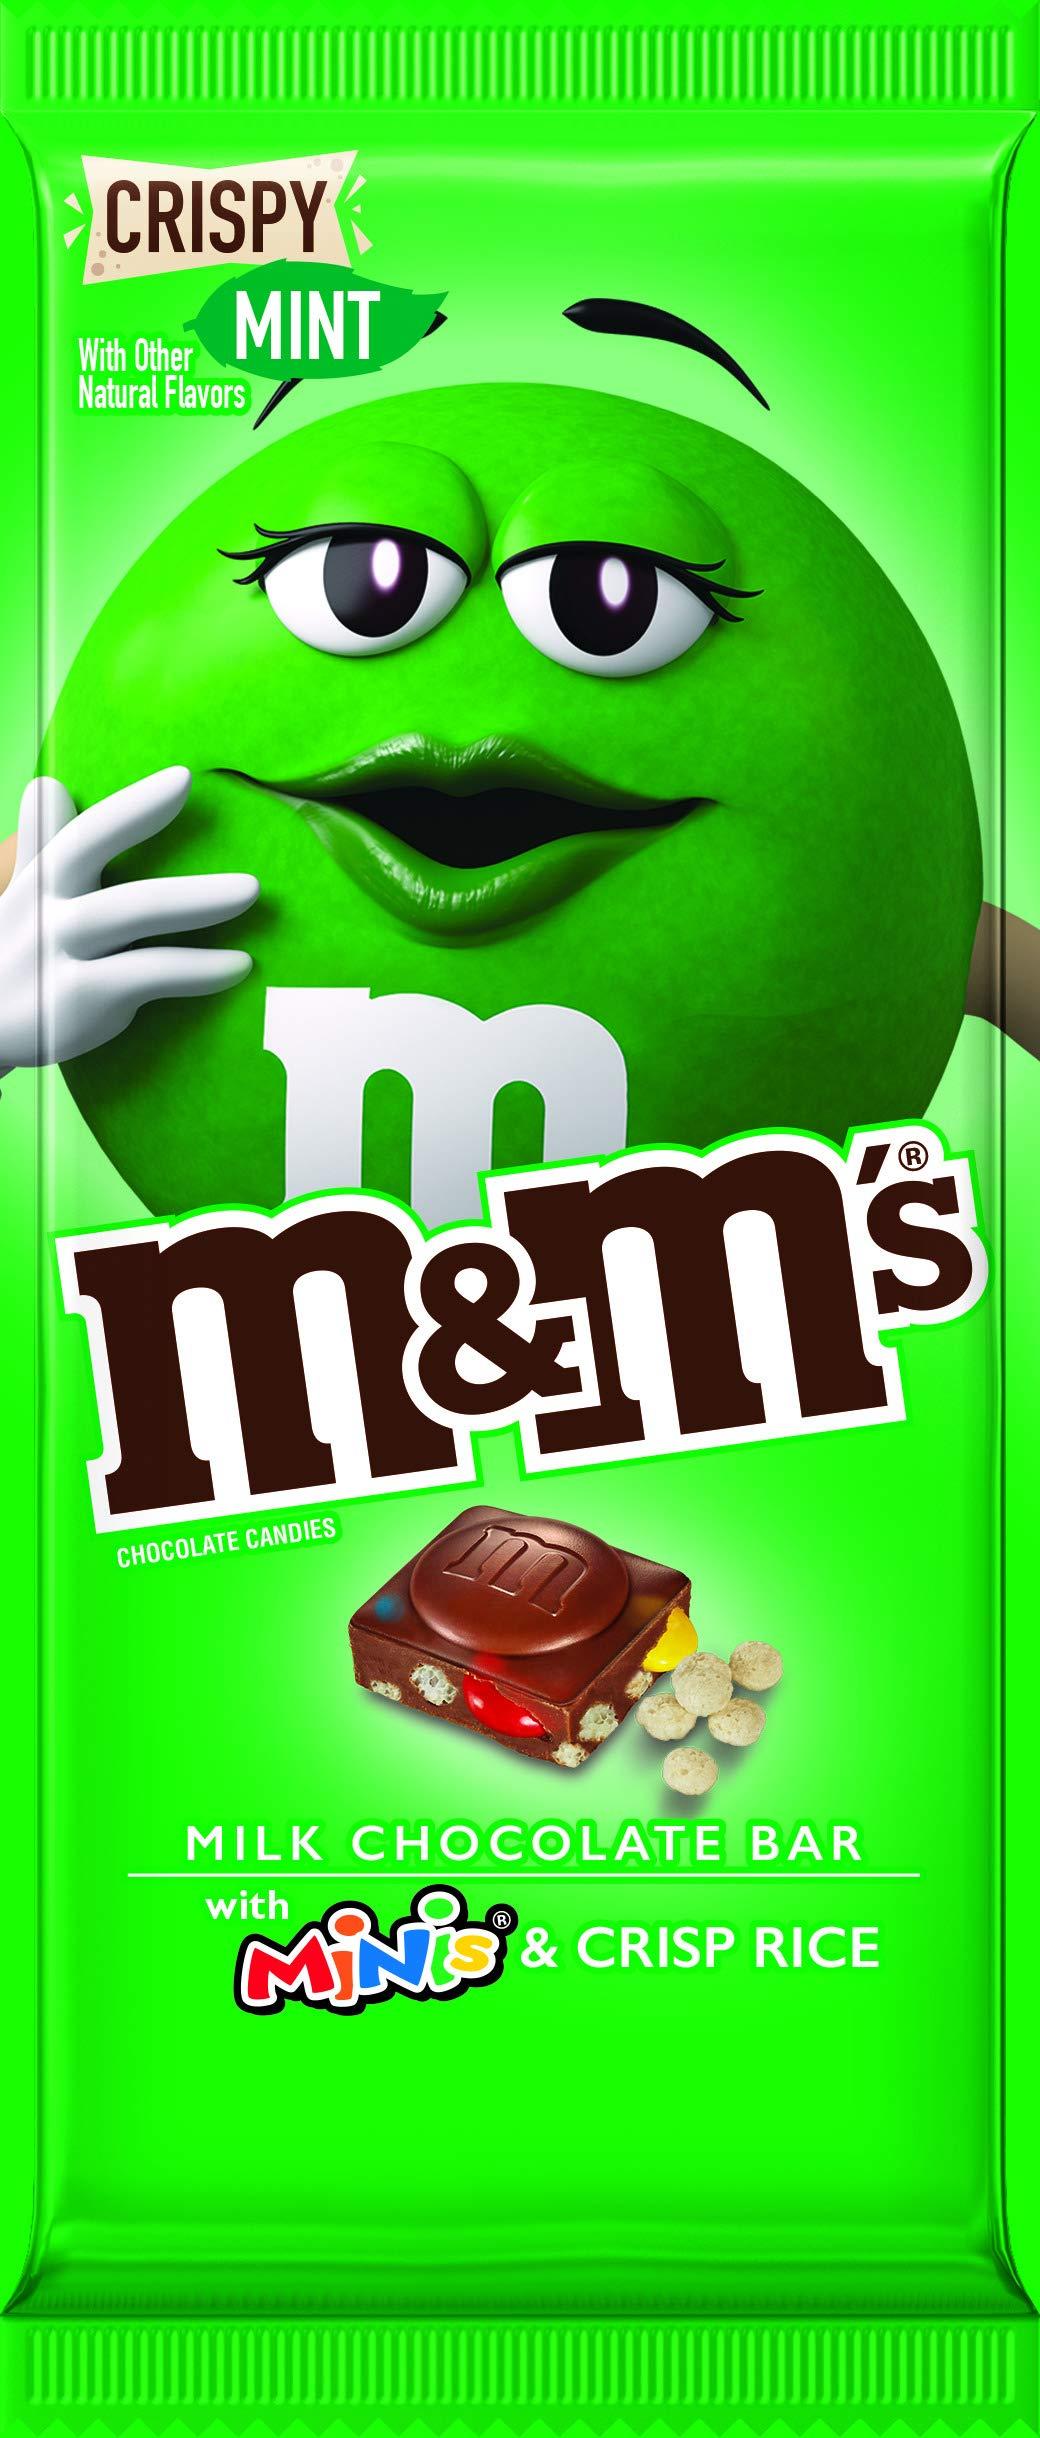 M&M's M&M'S Crispy Mint & Minis Milk Chocolate Candy Bar, 3.8-Ounce Bar, 3.8 oz